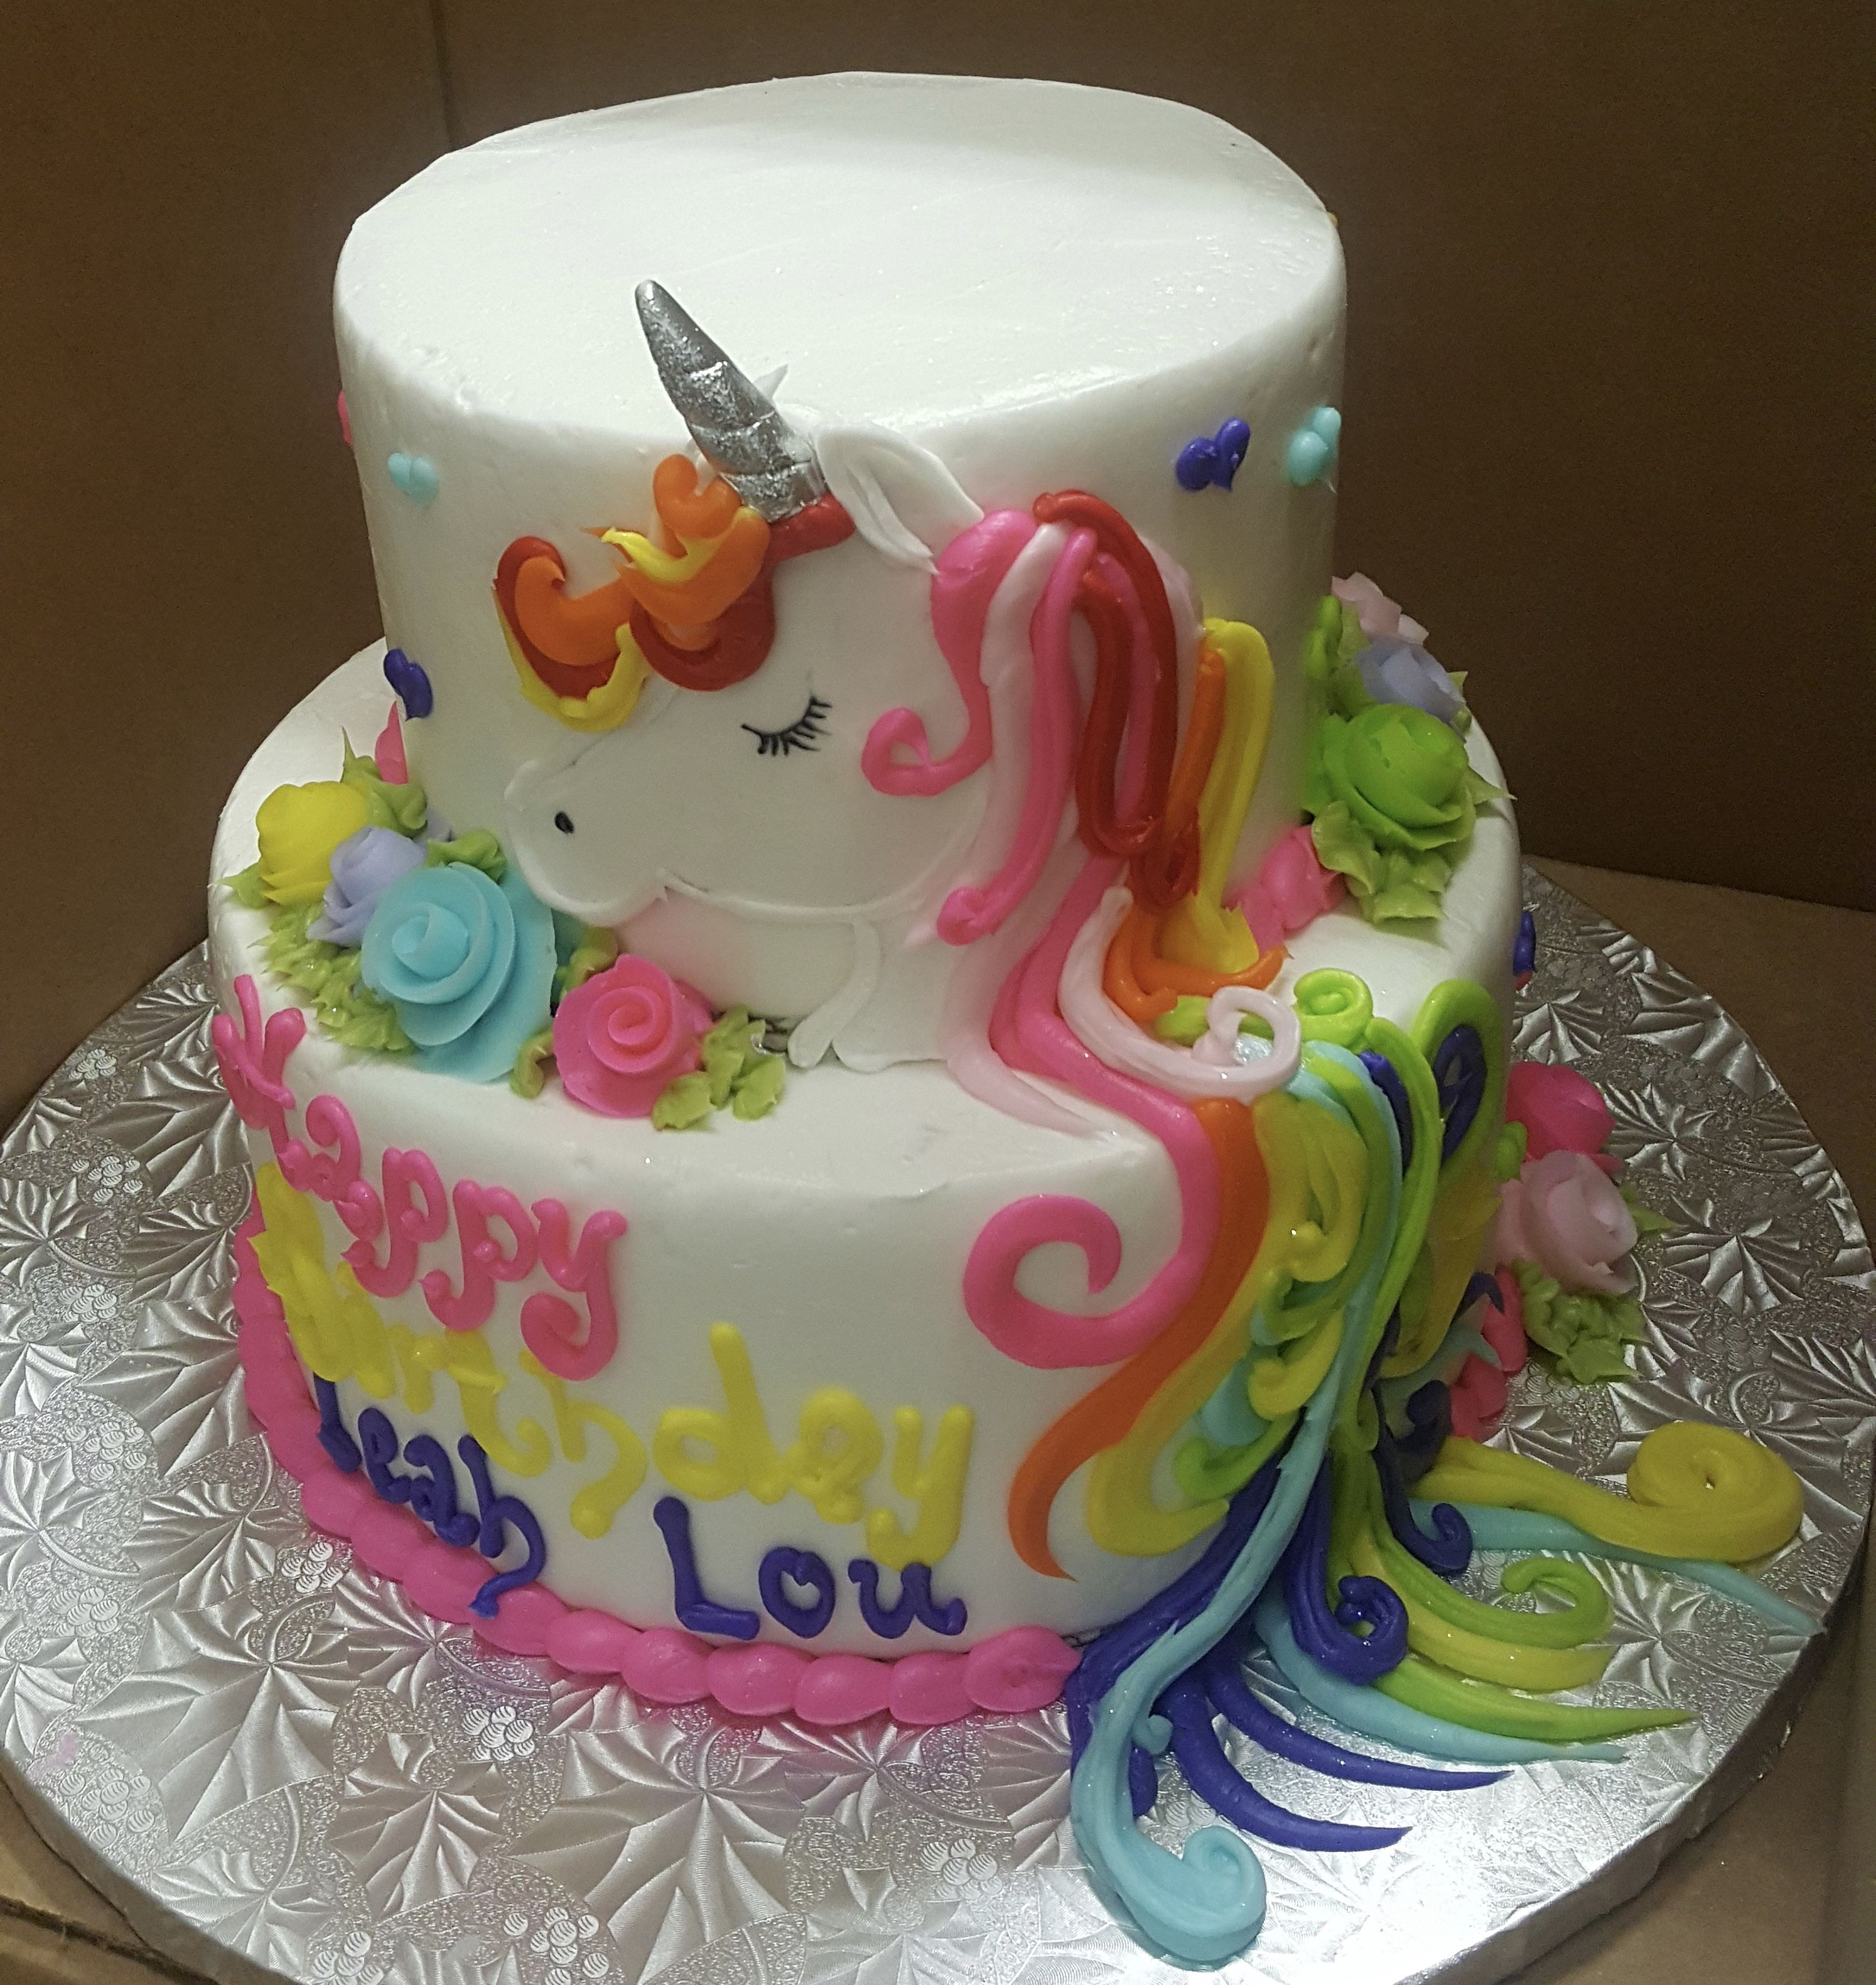 Calumet Bakery Two Tier Unicorn Drawn Cake Calumet Bakery Bakery Cake